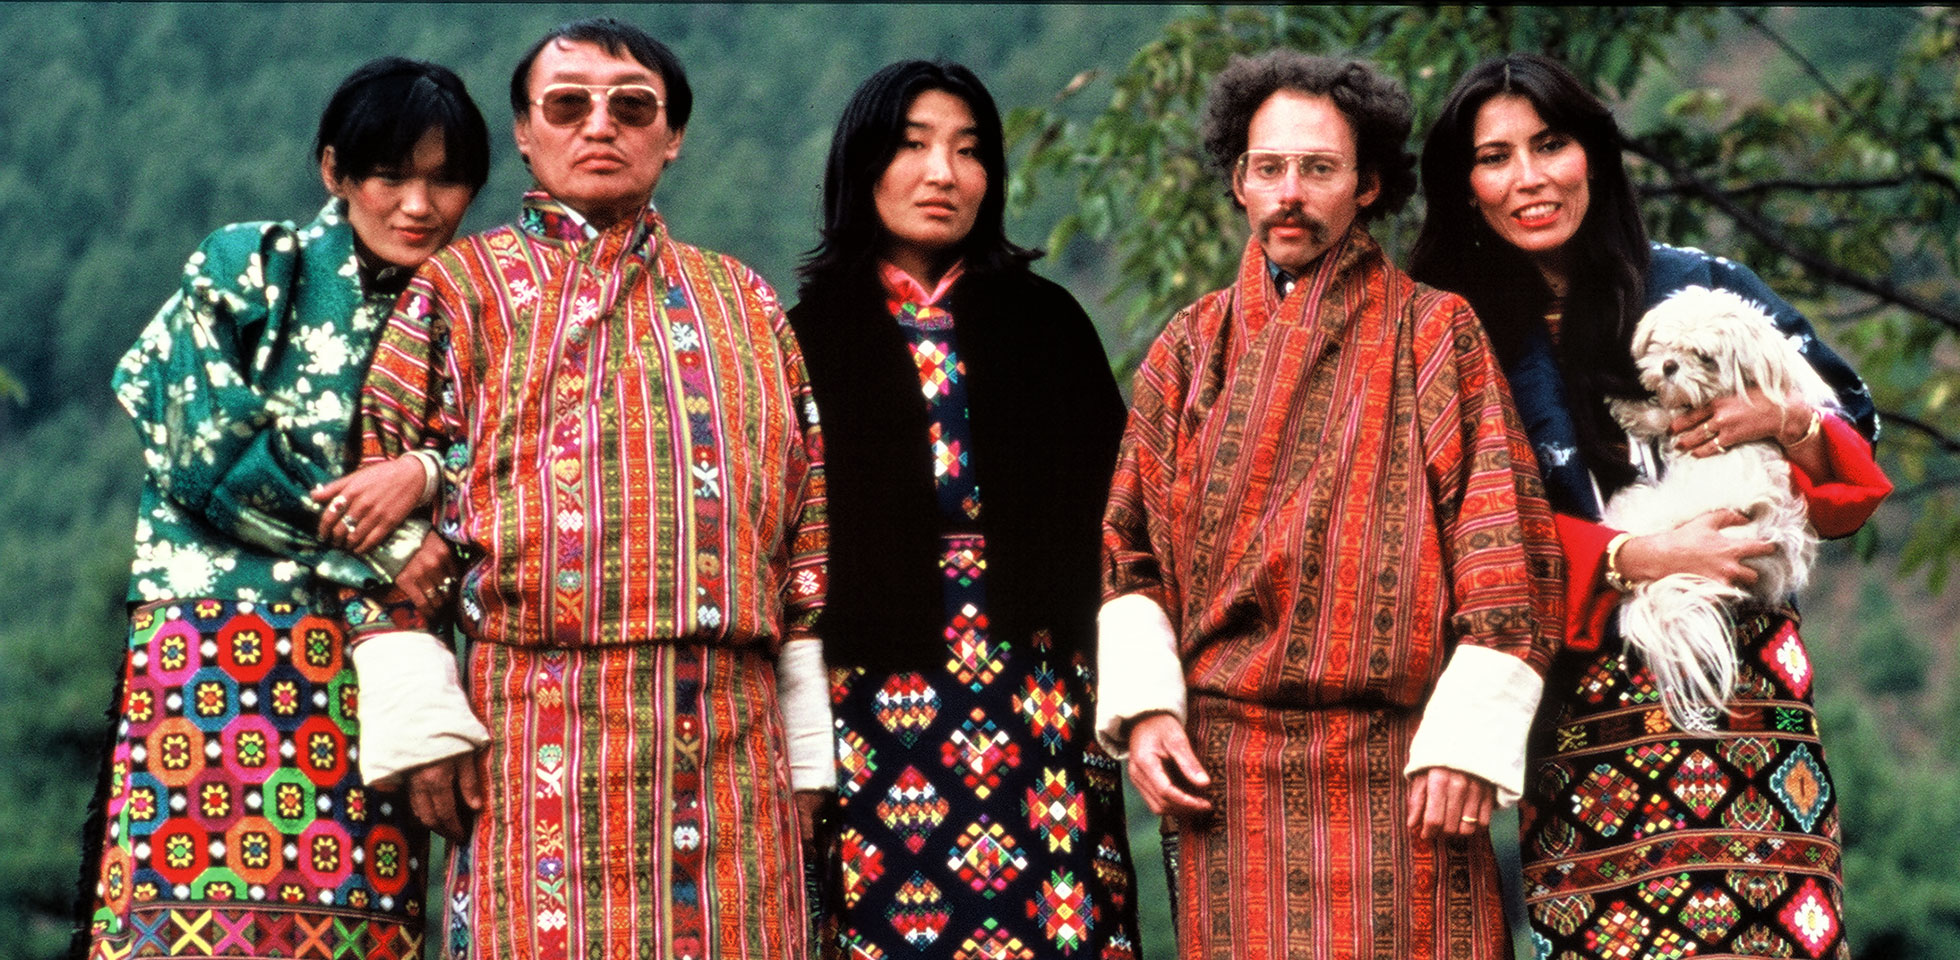 Bhutan as Few Others Know It